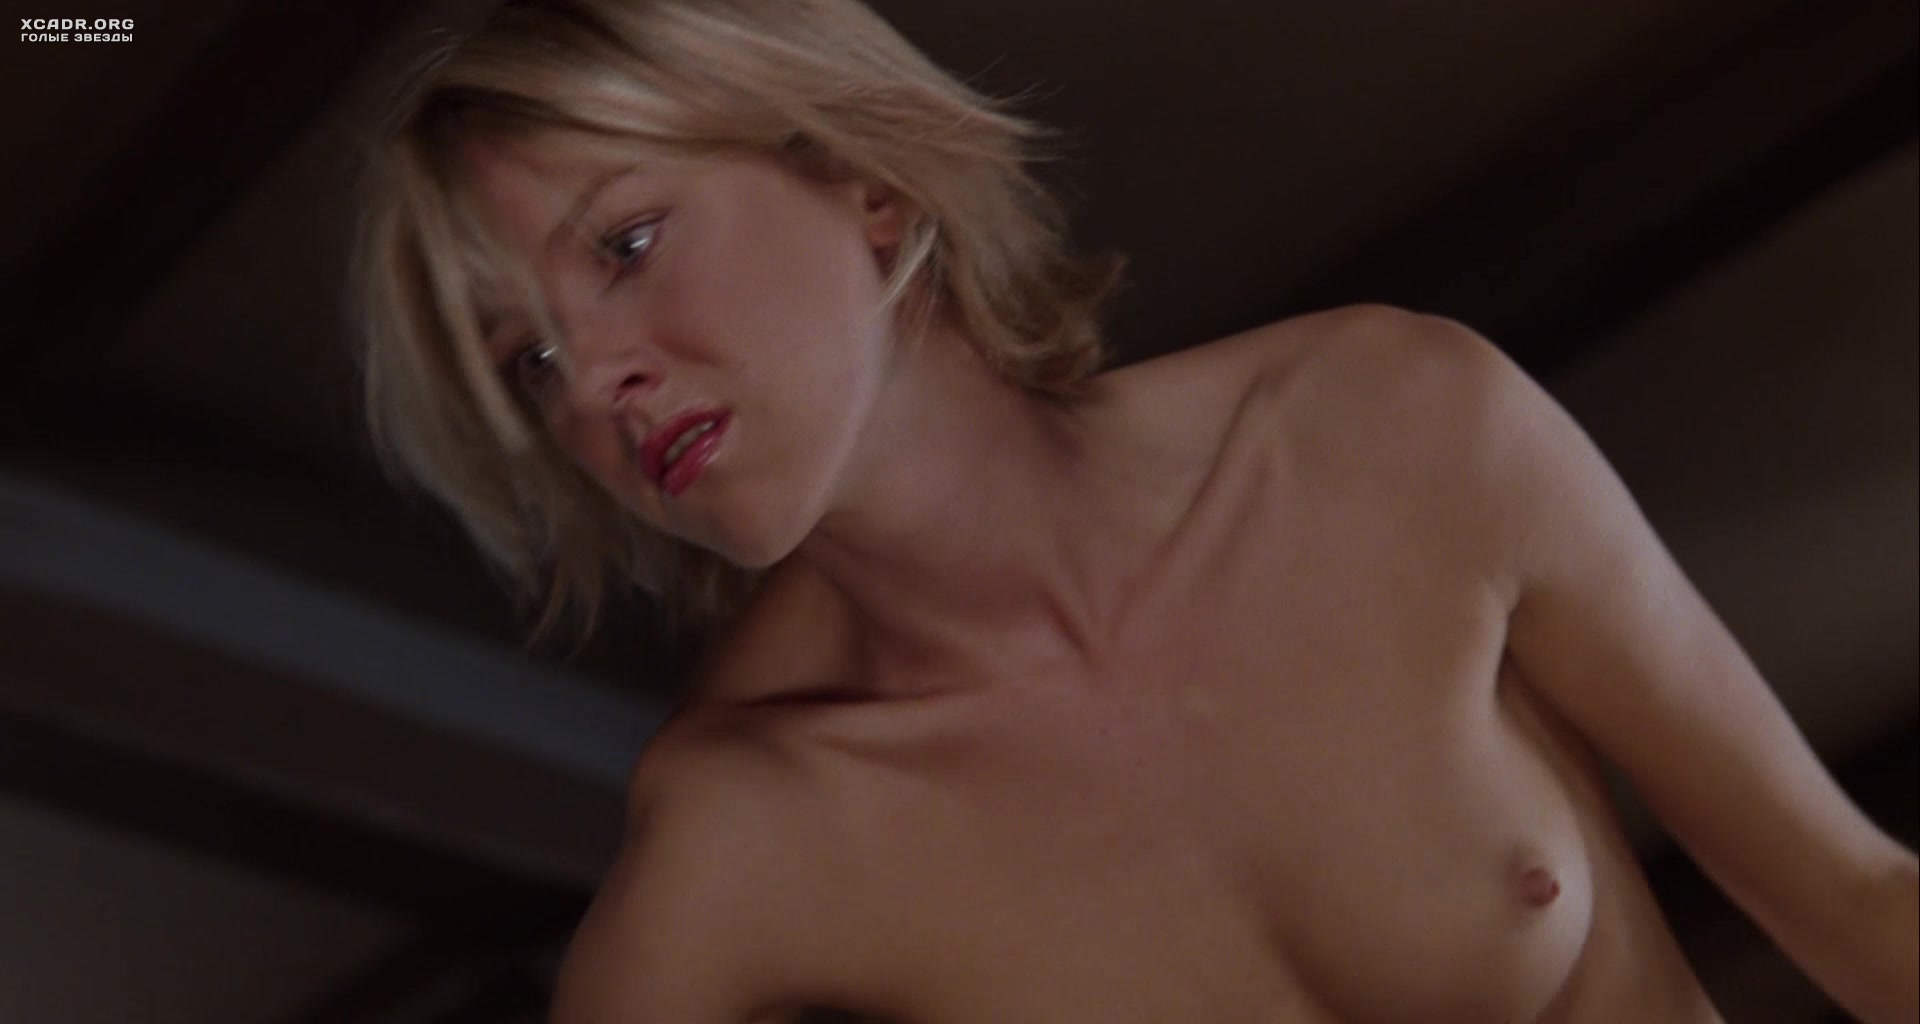 Наоми Уоттс Nude